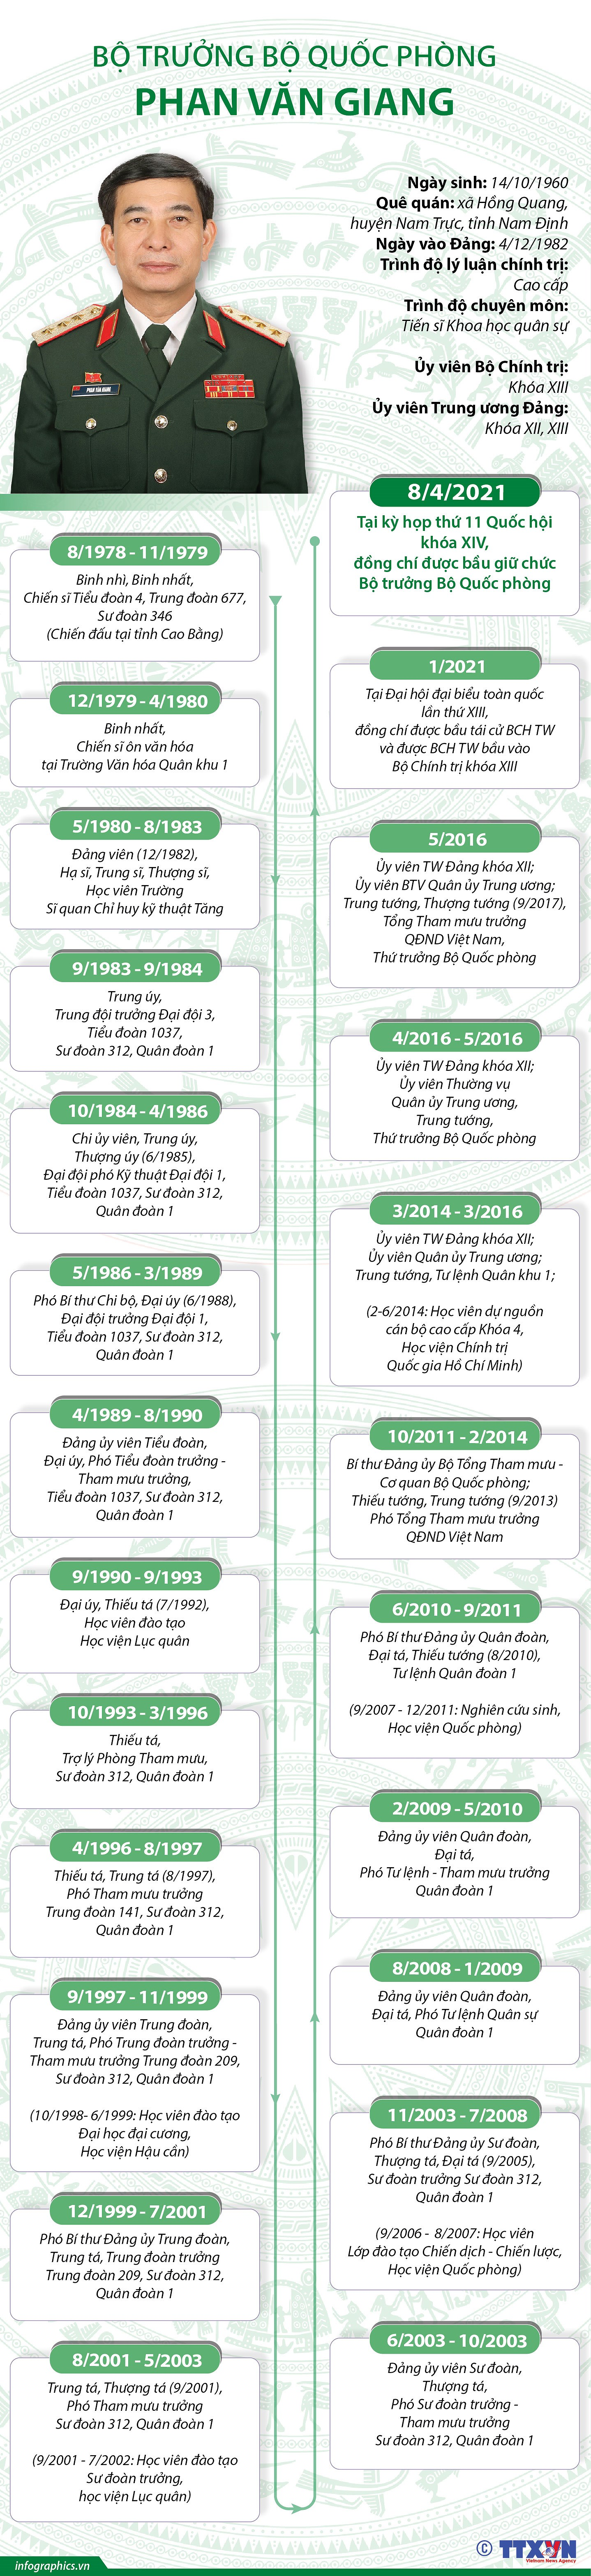 [Infographics] Tieu su Bo truong Bo Quoc phong Phan Van Giang hinh anh 1